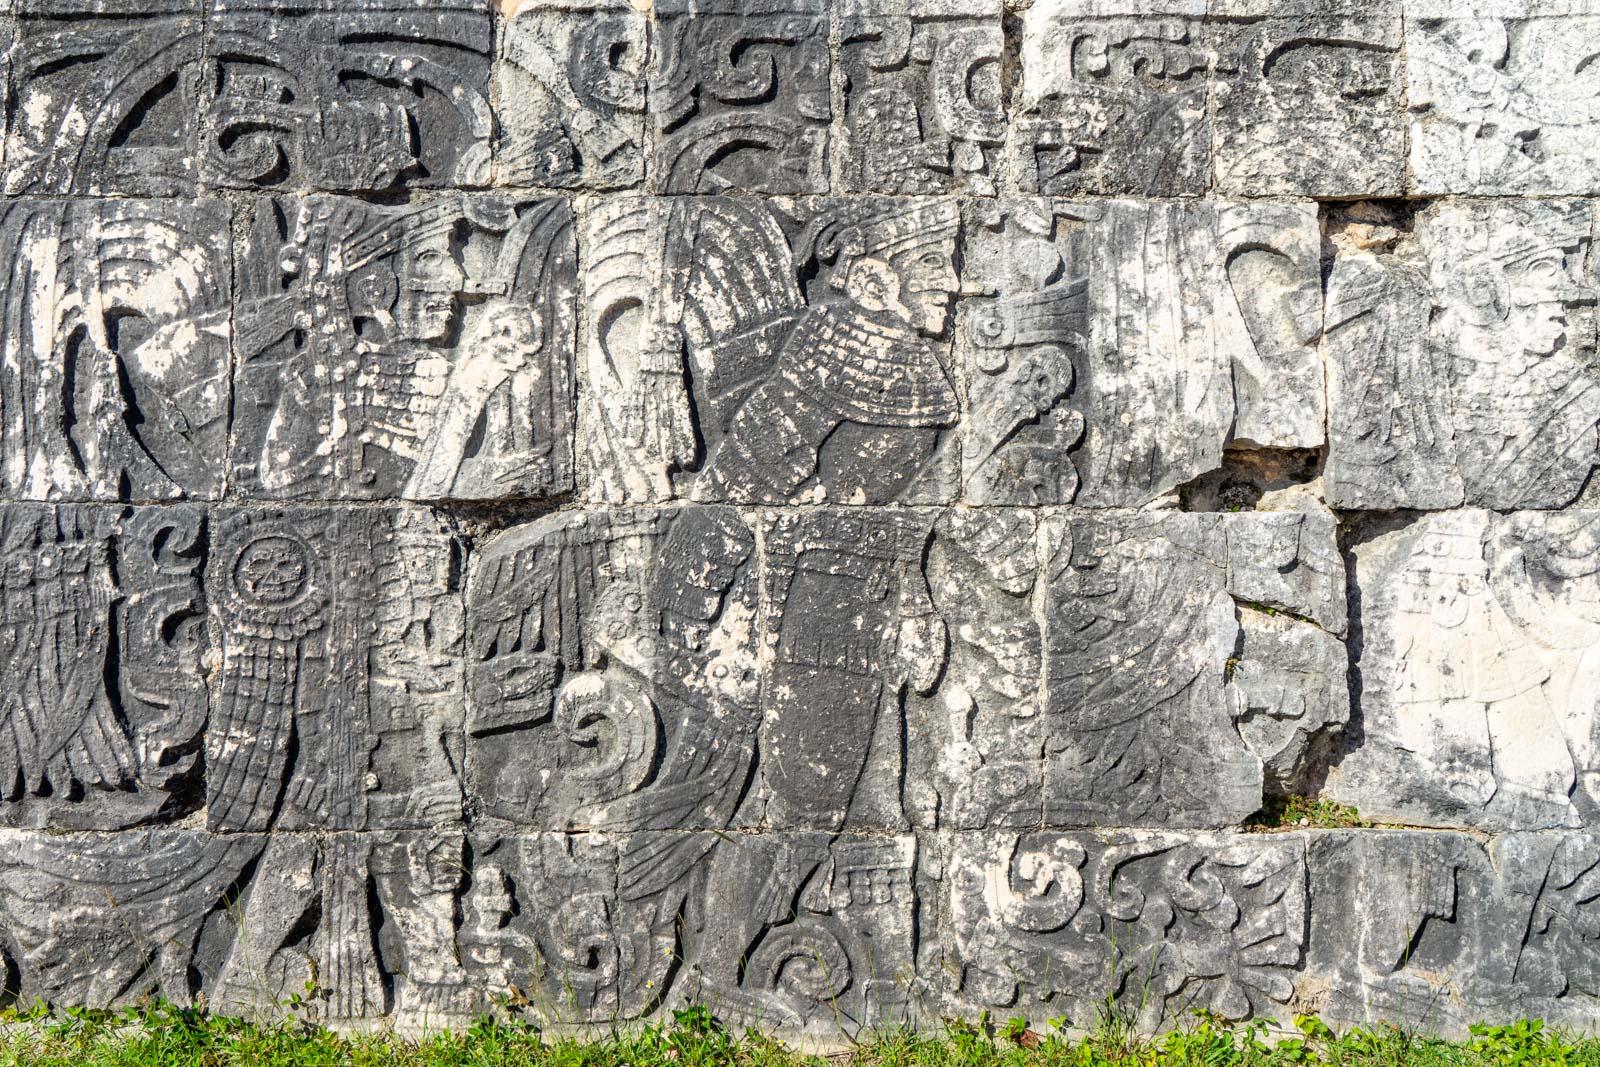 Chichen Itza Tour, Mayan ruins near Cancun, Mexico